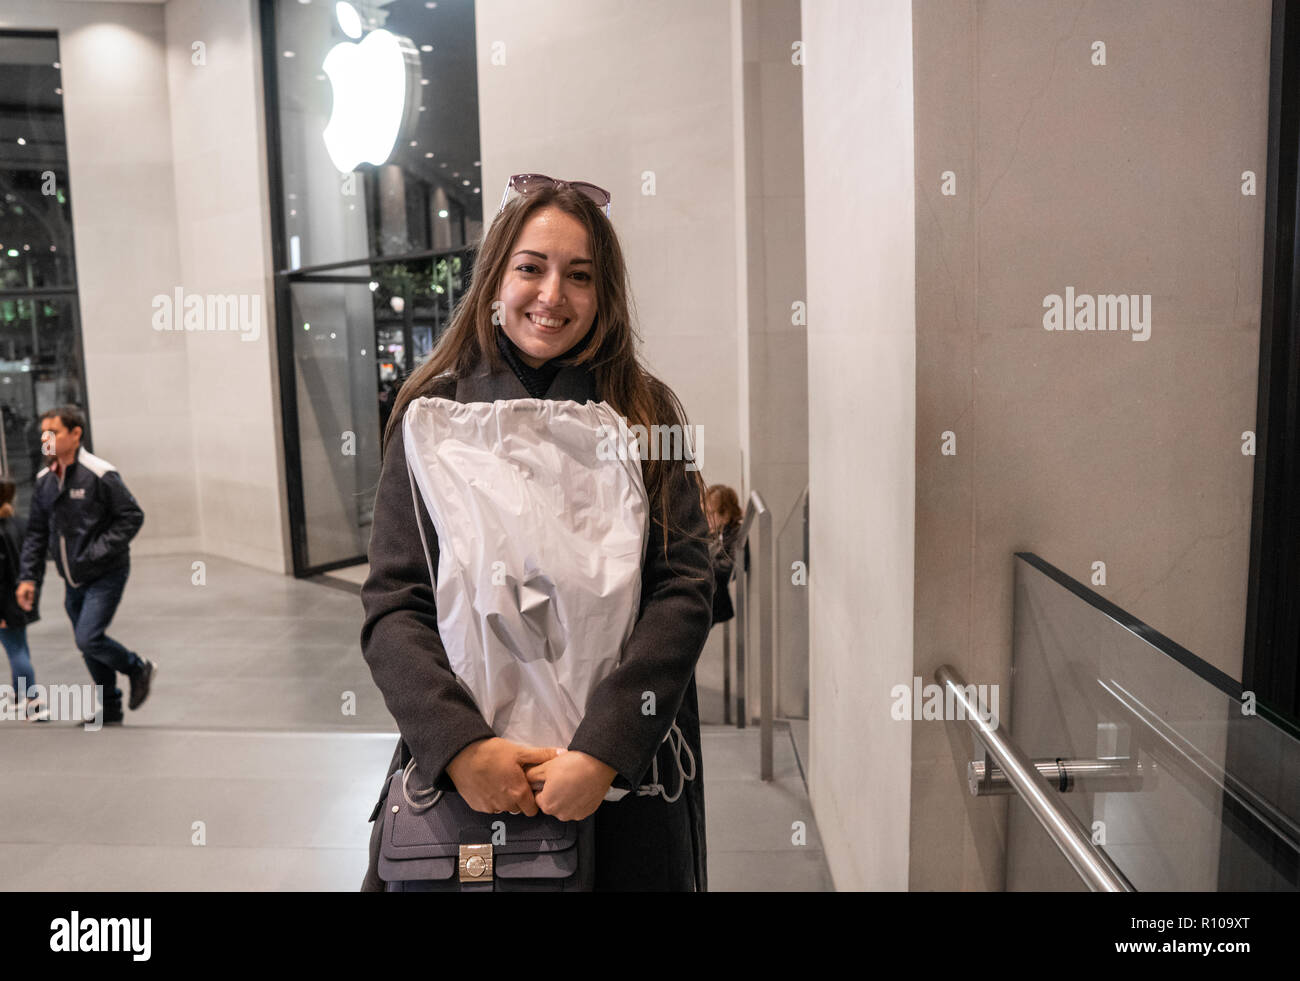 Barcelona, Spain - November 07, 2018: Woman holding a new iPad Pro - Stock Image